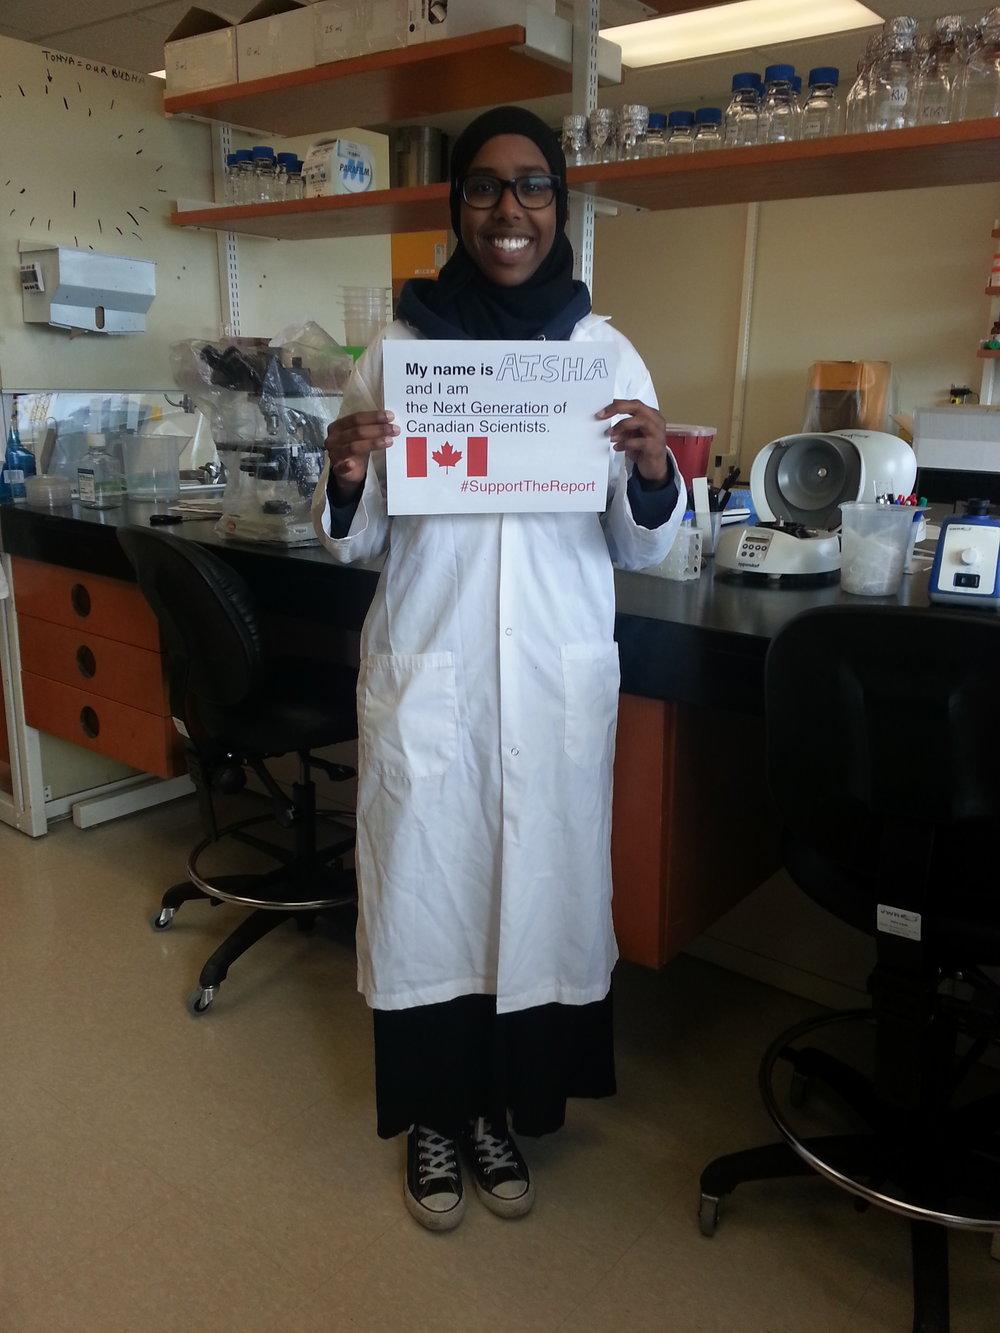 - Aisha BarkhadHonours B.Sc. student in Biochemistry (Microbiology & Immunology)